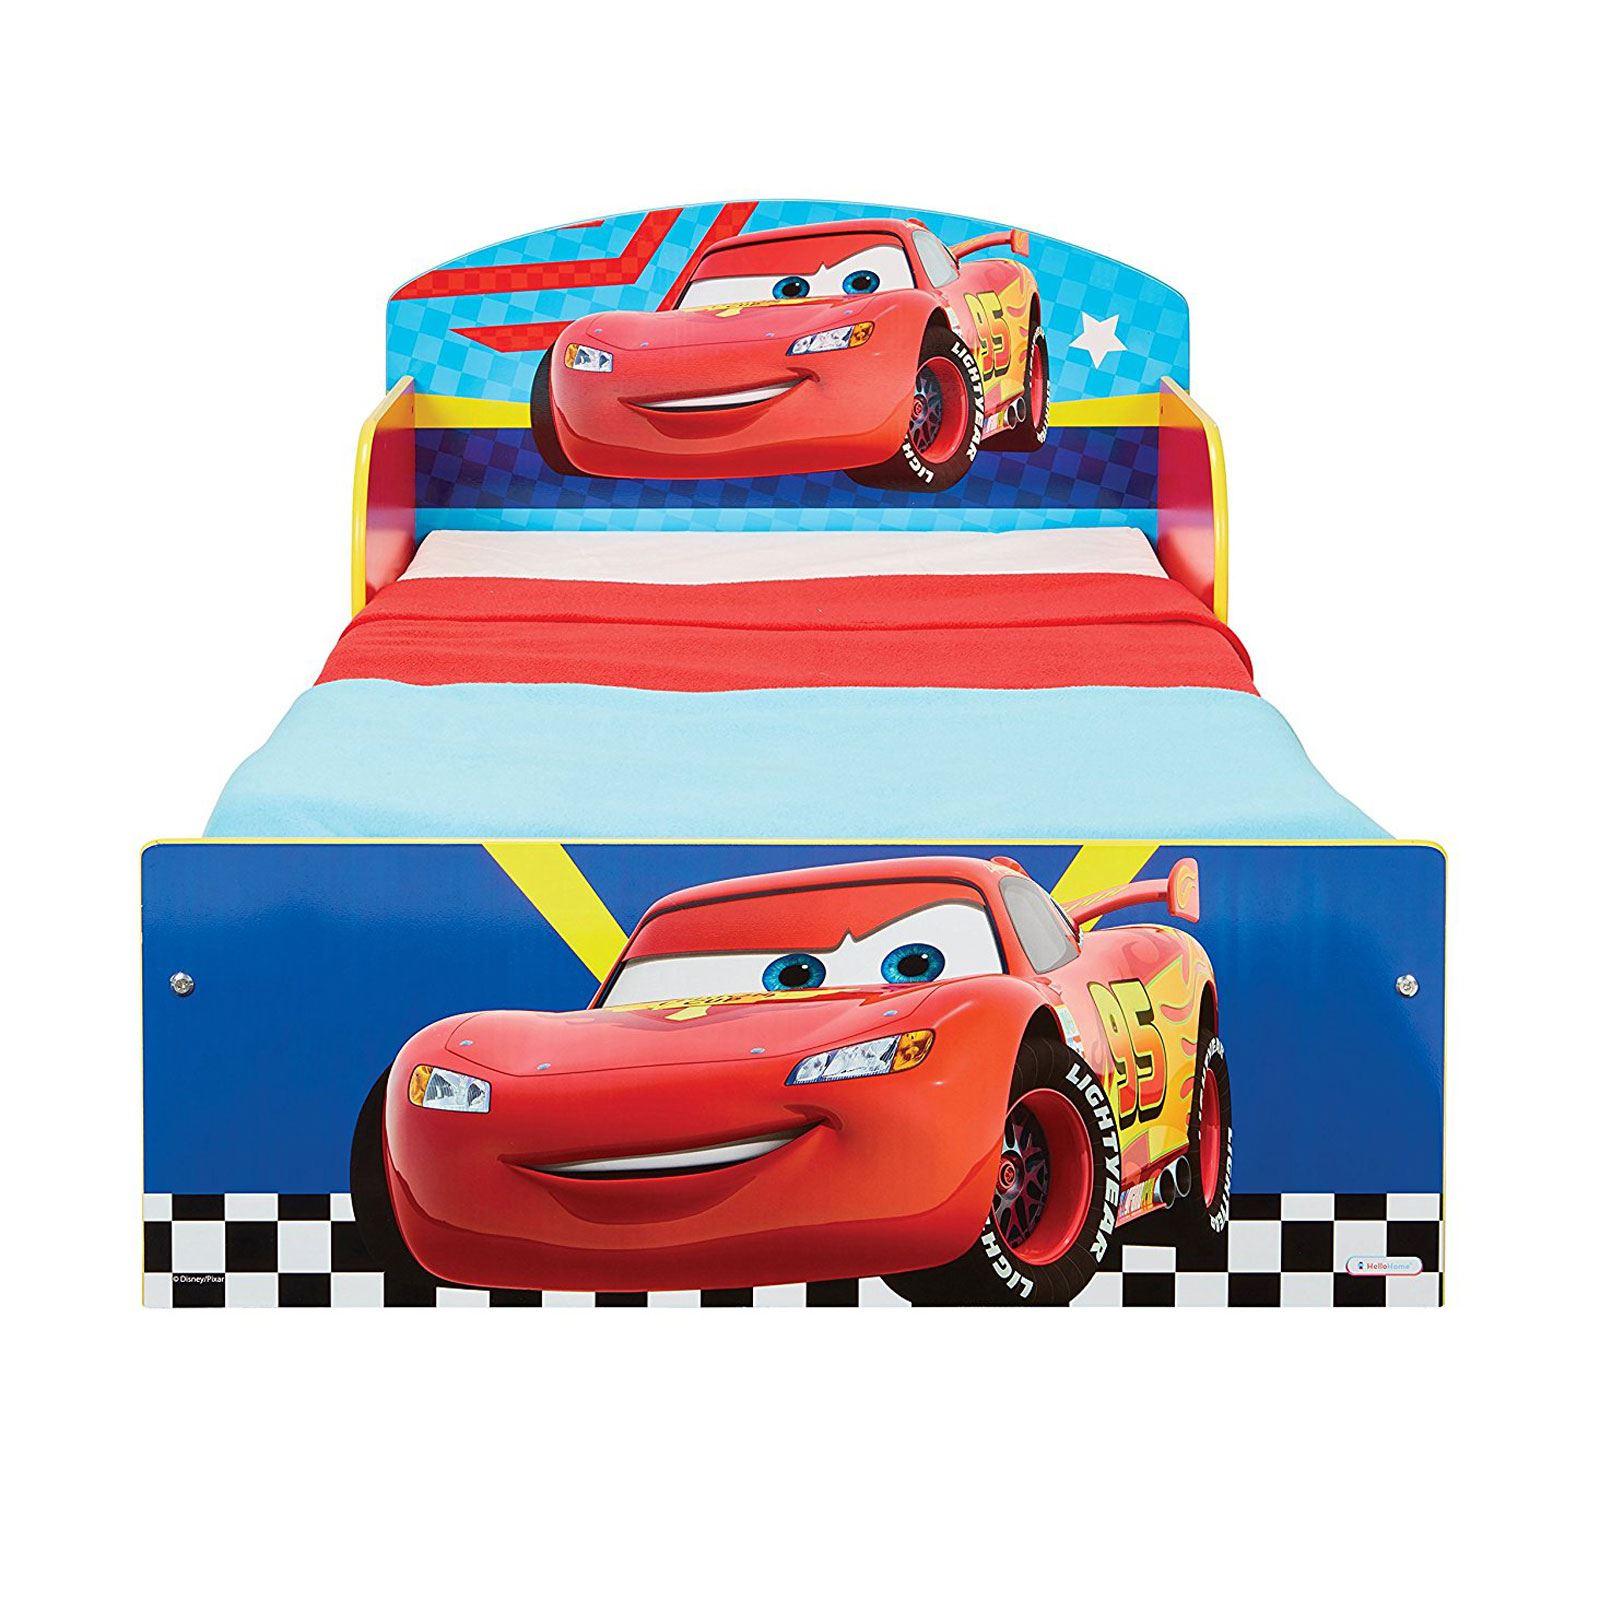 miniatura 6 - KIDS CHARACTER TODDLER BEDS - BOYS GIRLS BEDROOM DISNEY